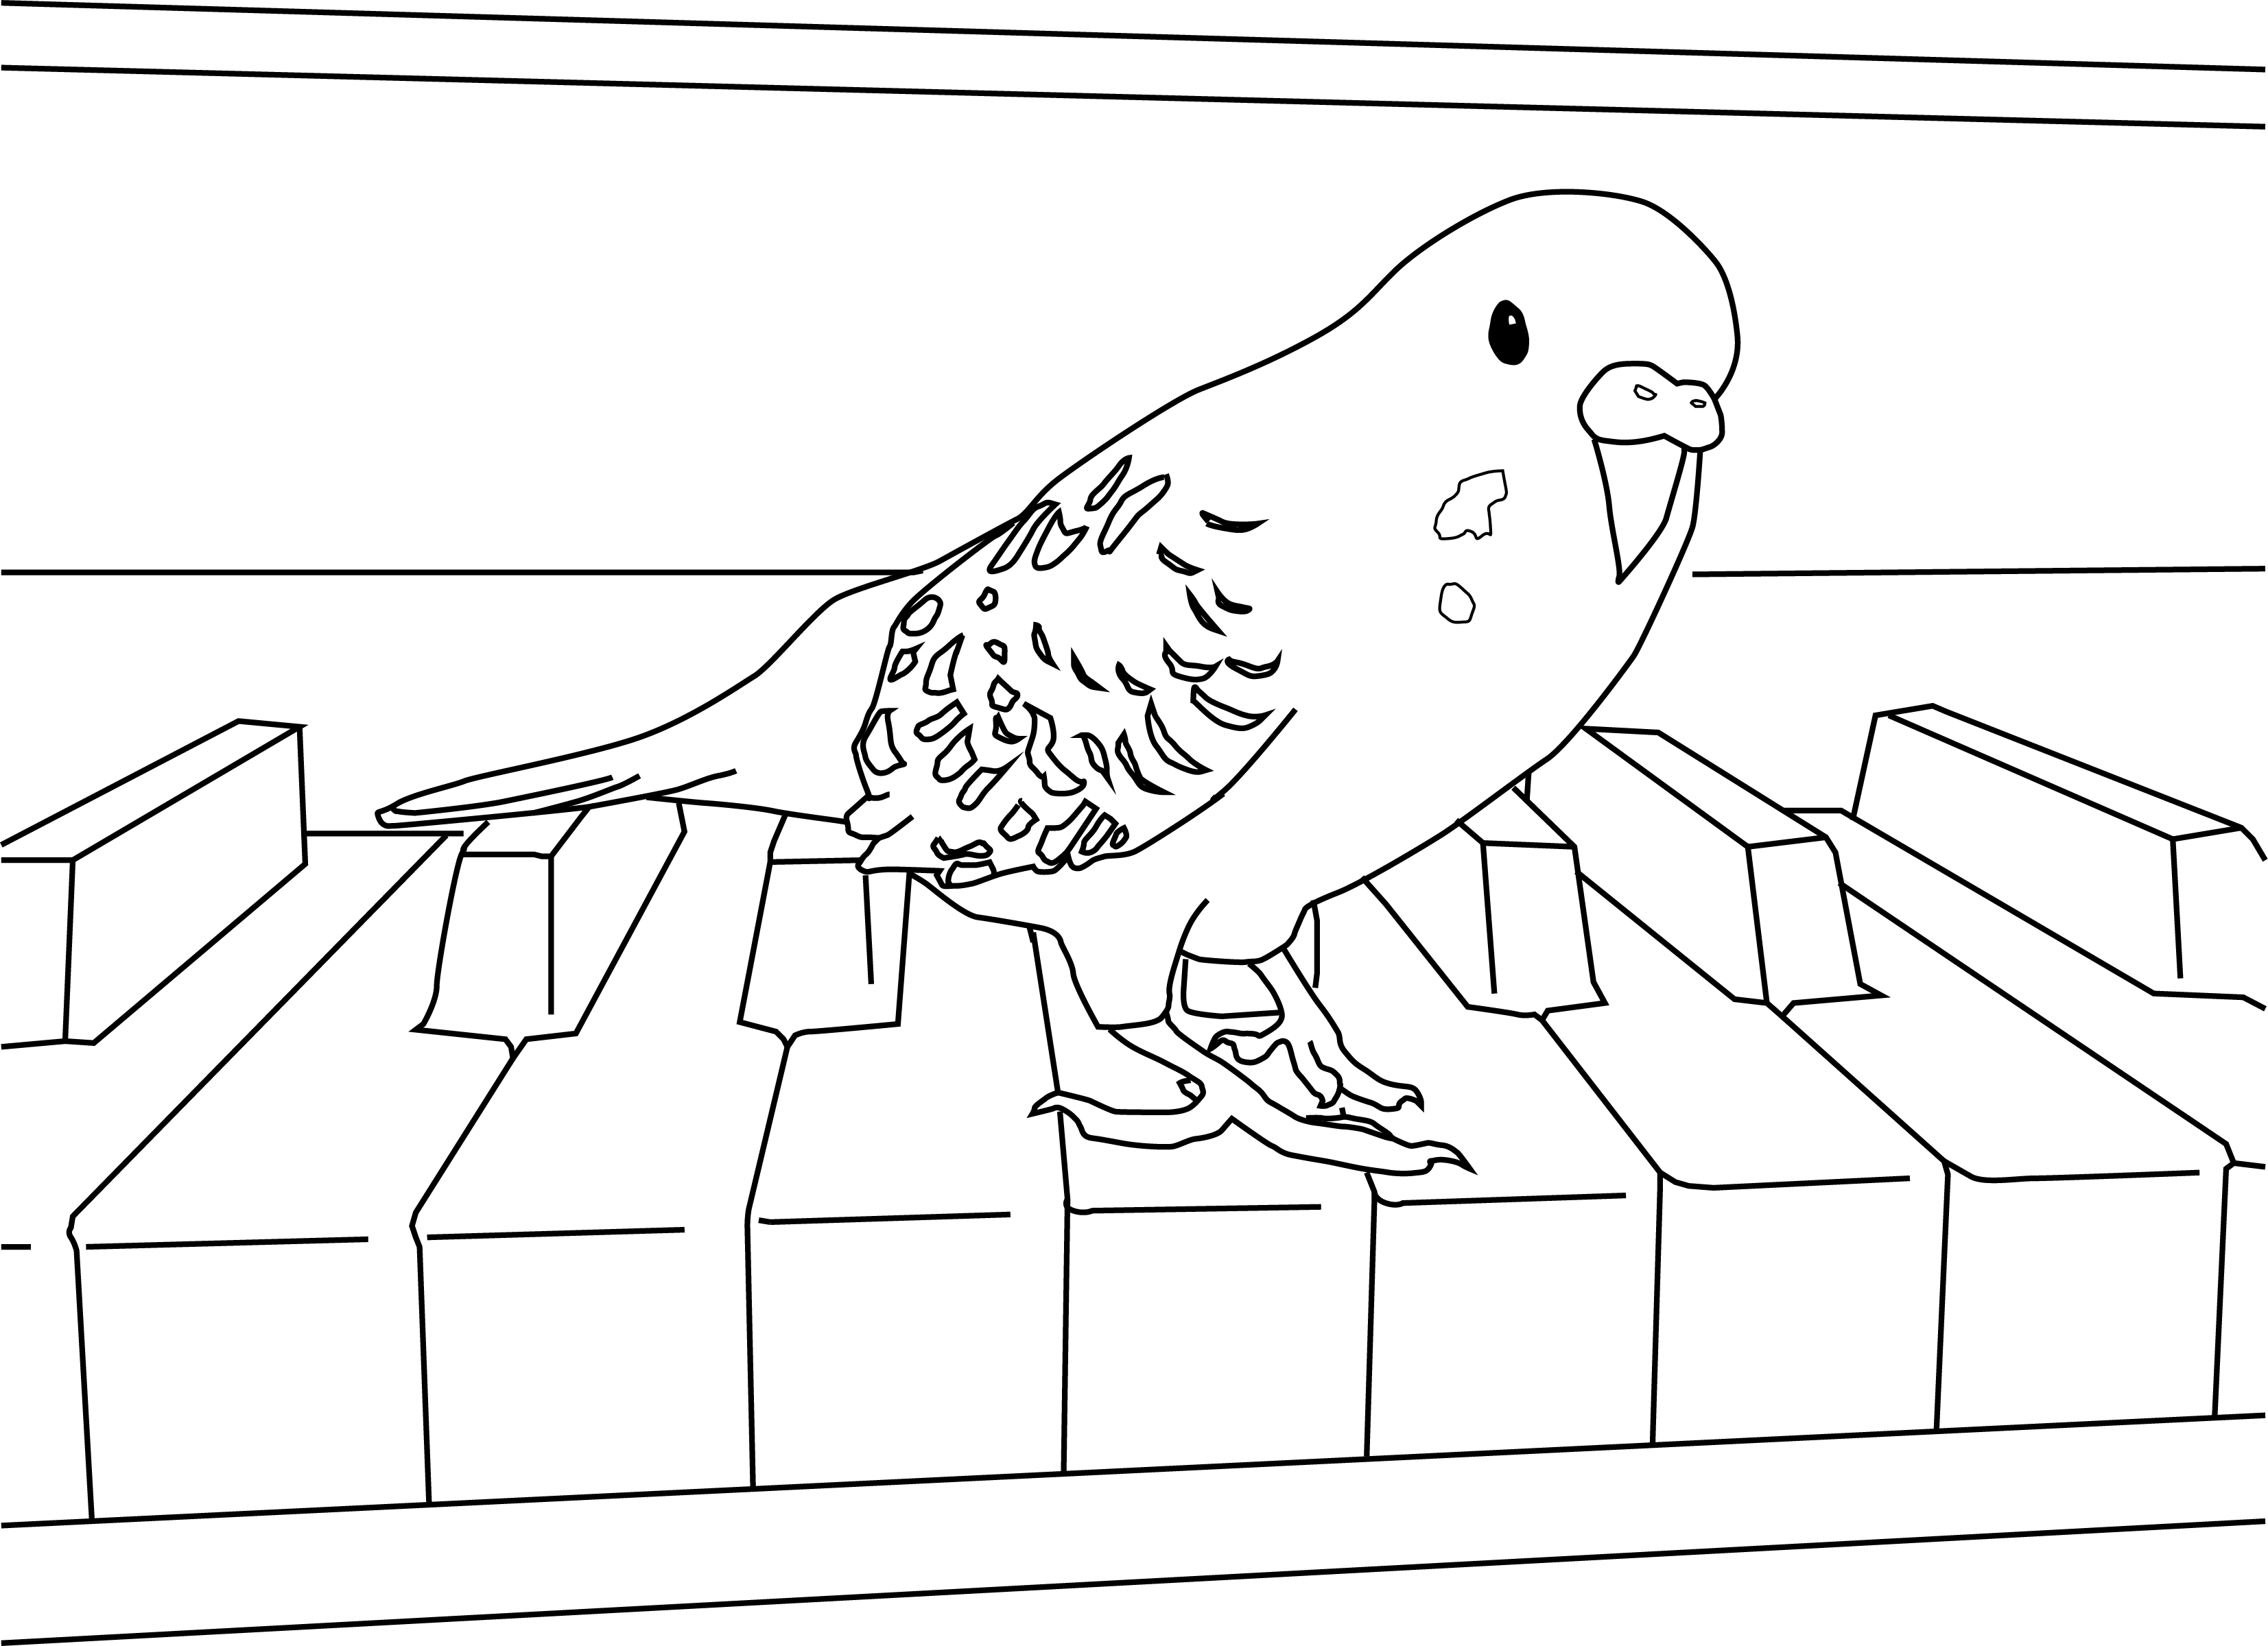 Parakeet Coloring Pages Parakeet Parakeet Coloring Pages Cool